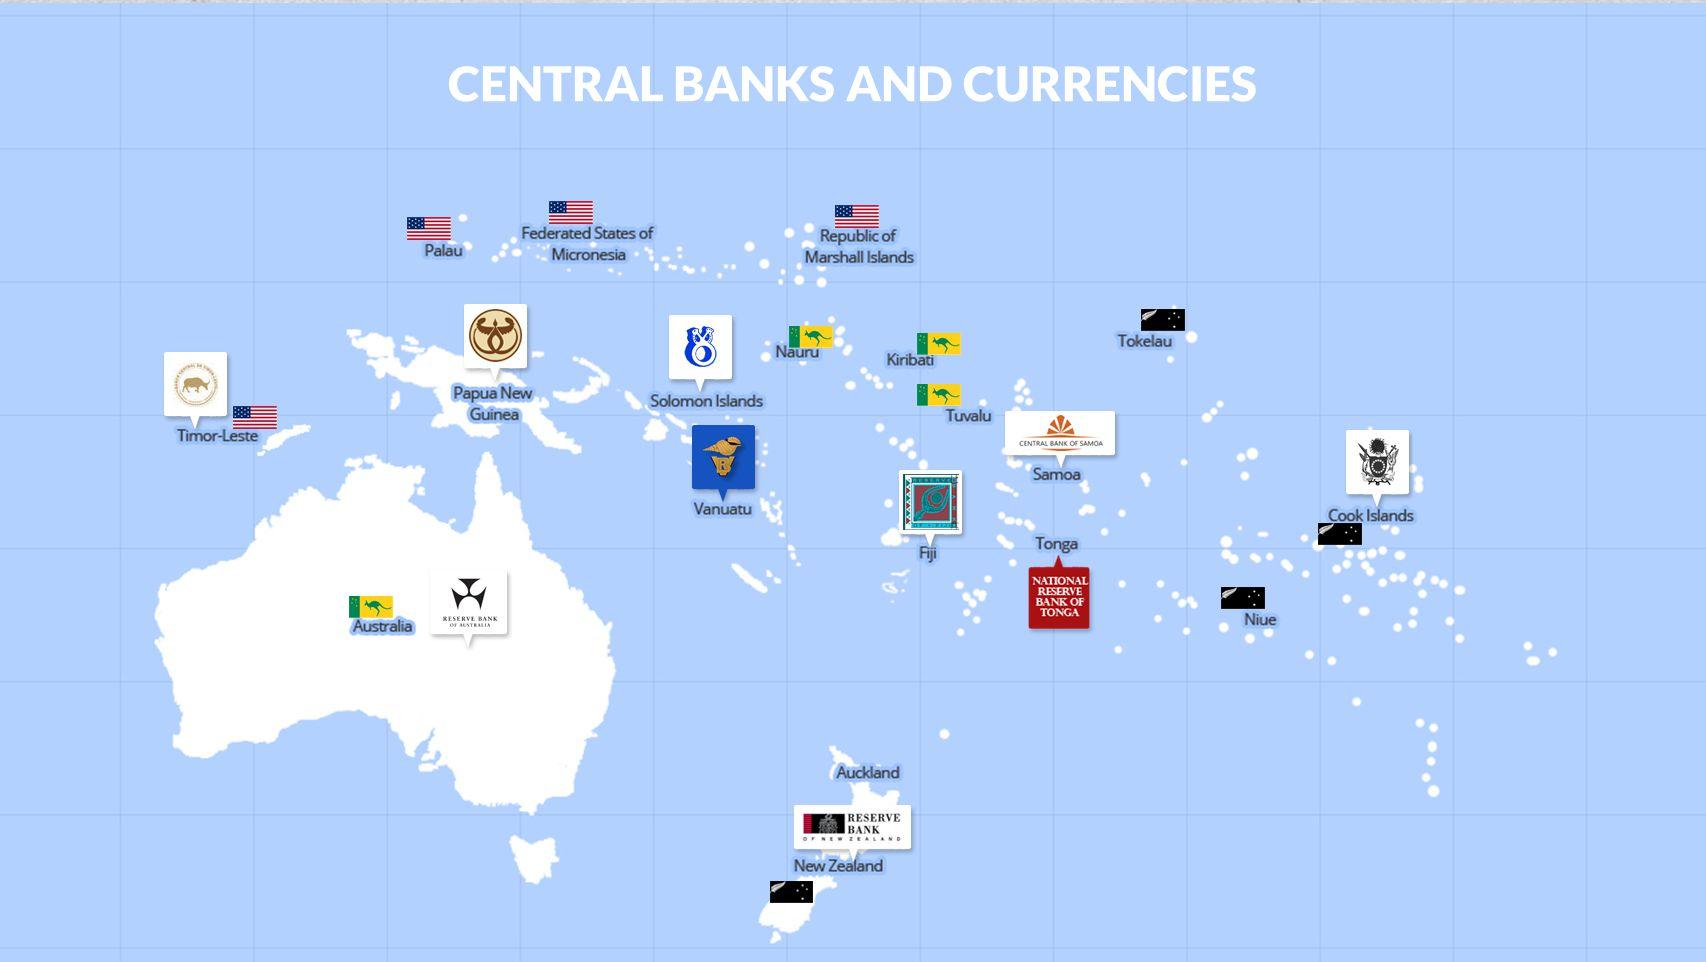 POPULATION MID 2013 - ALL 18 COUNTRIES 0 25,000,000 20,000,000 15,000,000 10,000,000 5,000,000 AustraliaPapua New GuineaNew ZealandTimor-LesteFijiSolomon IslandsVanuatuSamoaKiribatiFSMTongaRMICook IslandsPalauTuvaluNauruNiueTokelau